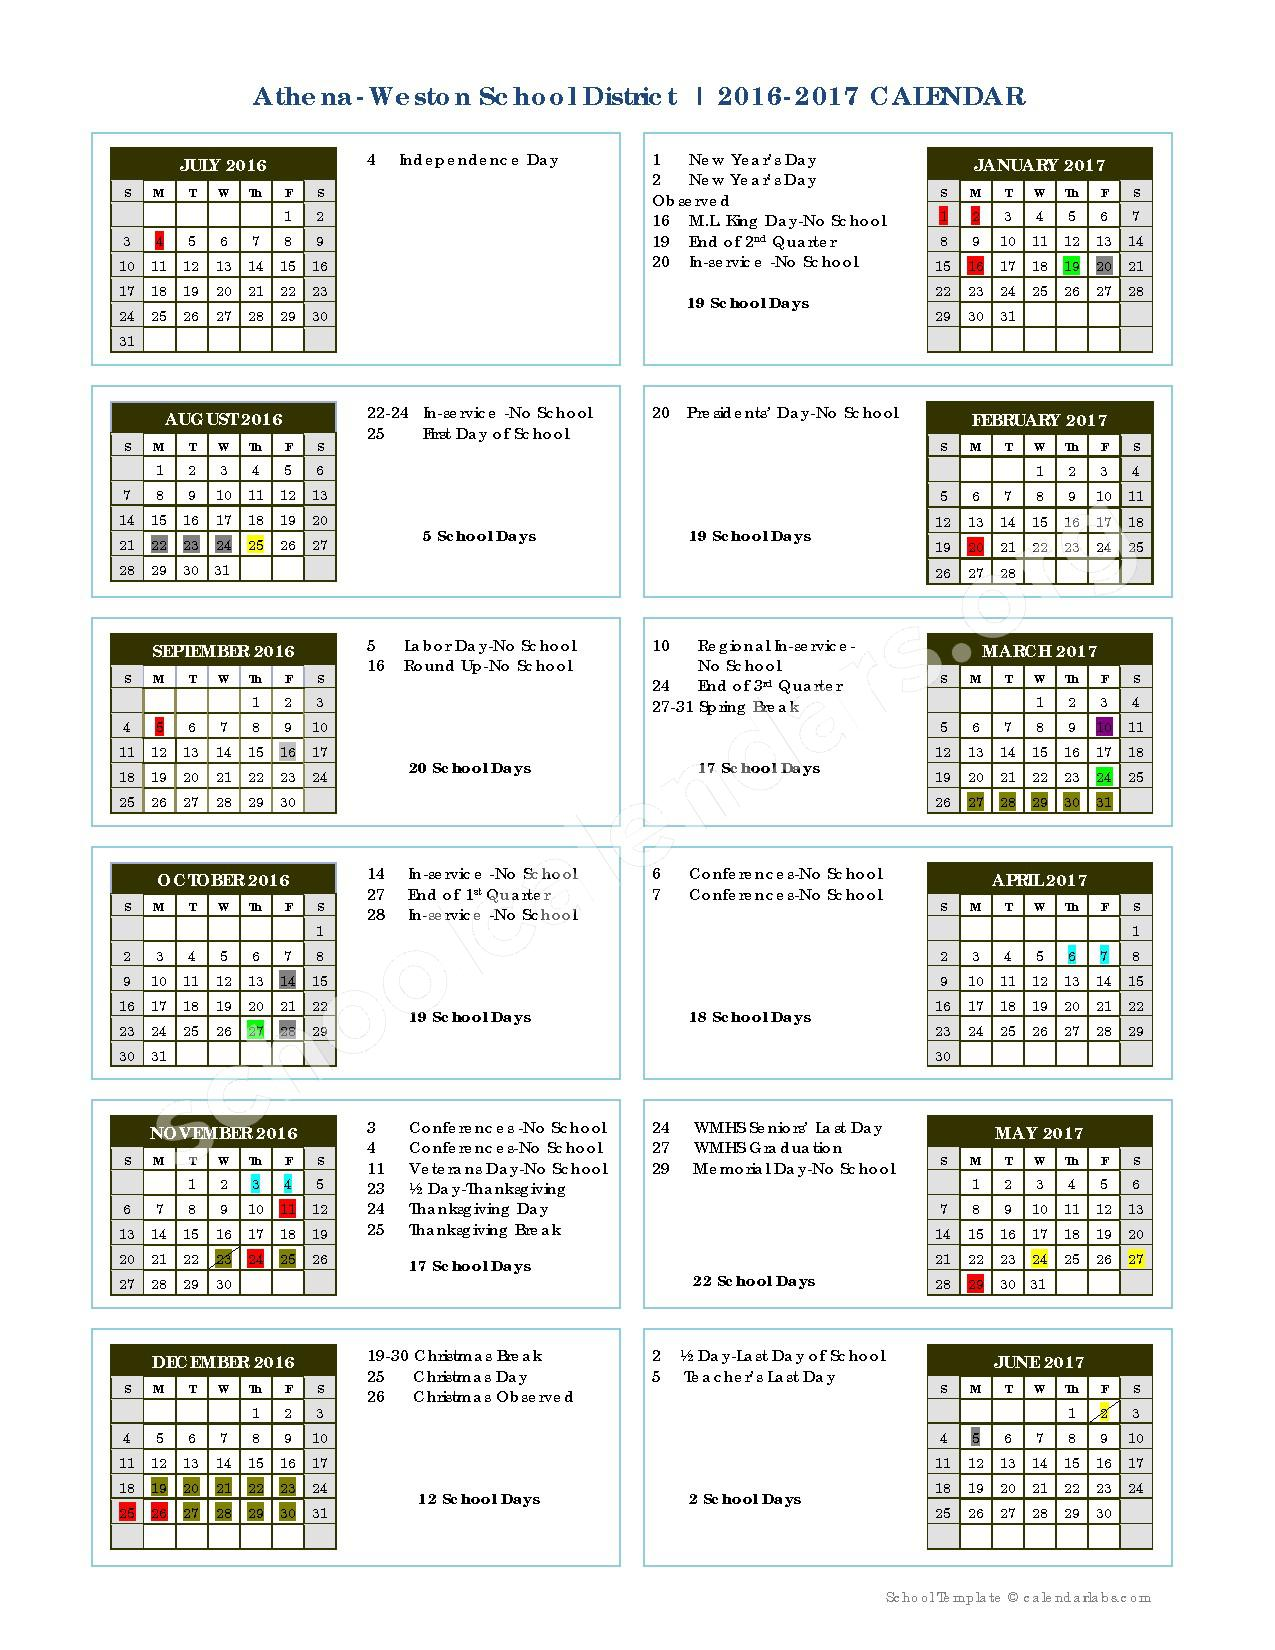 2016 - 2017  District Calendar – Athena-Weston School District – page 1